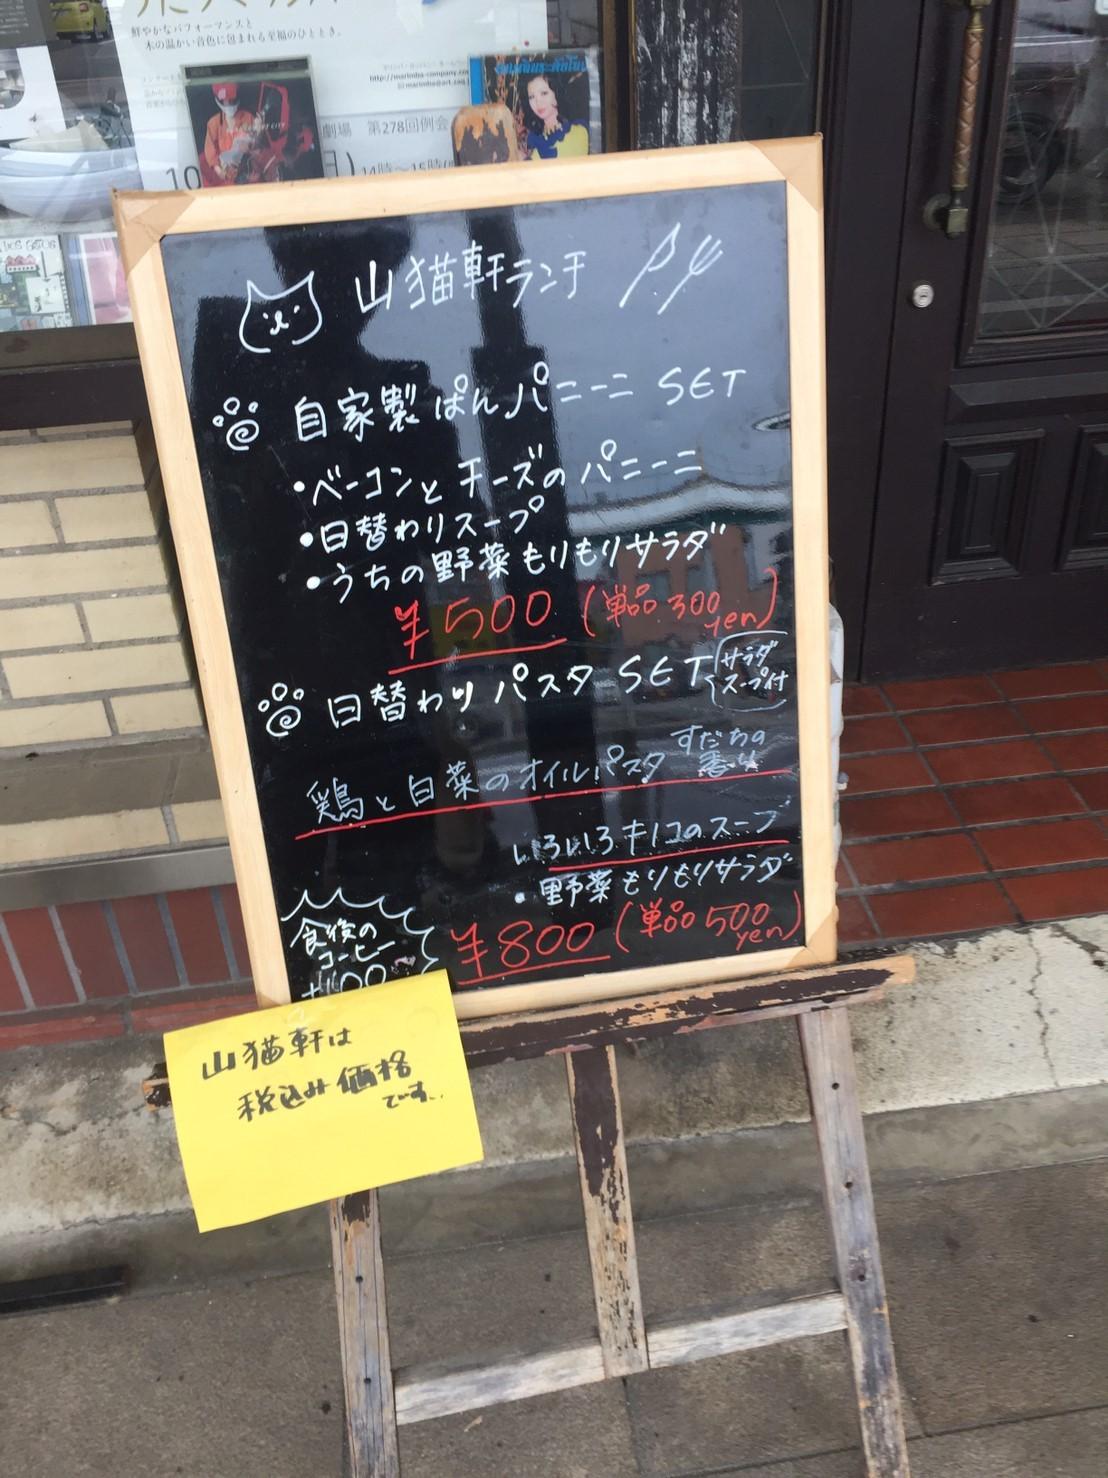 Vineria 農楽ttoria 山猫軒  荻ちゃんとランチ_e0115904_05265481.jpg